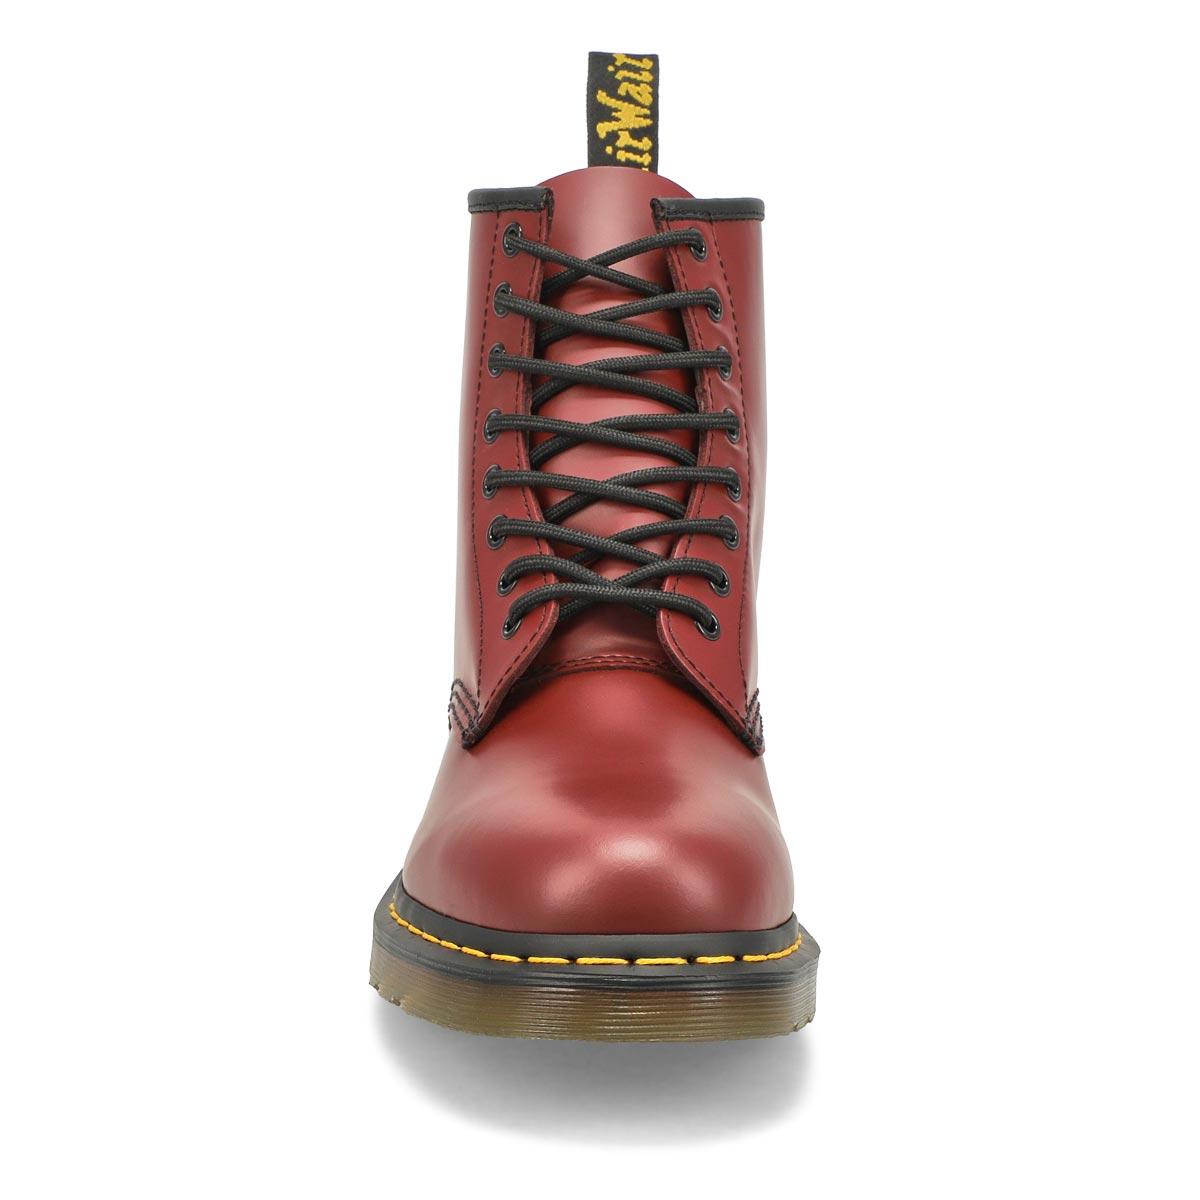 Mns 1460 8-Eye cherry rd smooth DMC sole